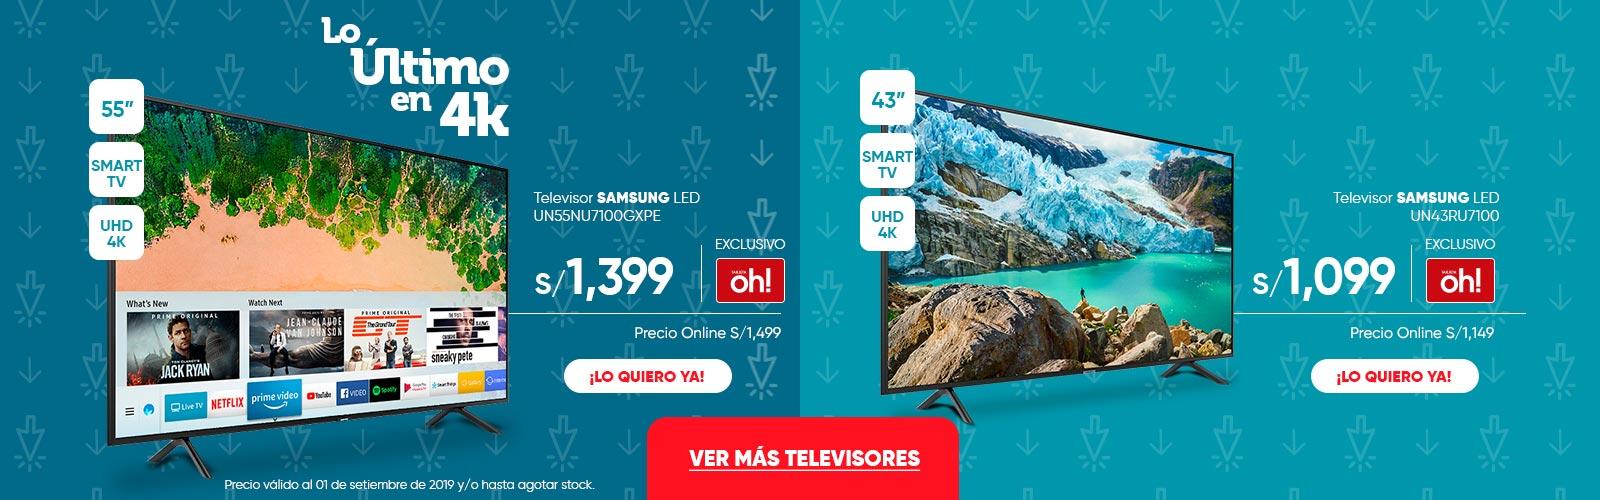 Televisor SAMSUNG LED UN55NU7100GXPE UN43RU7100